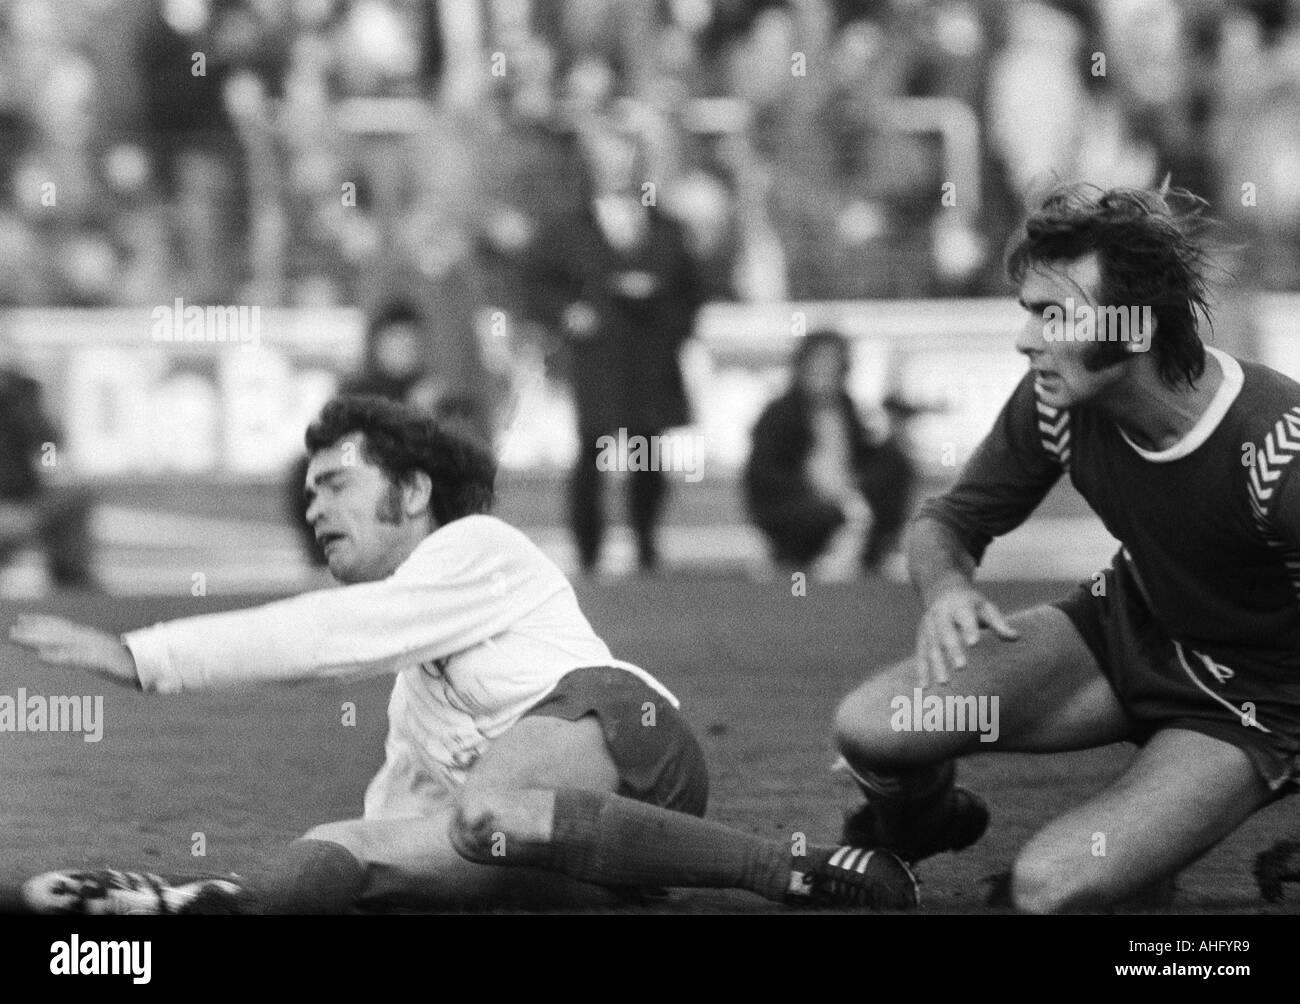 football, Regionalliga West, 1973/1974, Niederrhein Stadium in Oberhausen, Rot-Weiss Oberhausen versus Bayer 05 Uerdingen 2:0, scene of the match, duel between Rudi Neufeld (RWO) left and Edmund Stieber (Bayer) - Stock Image